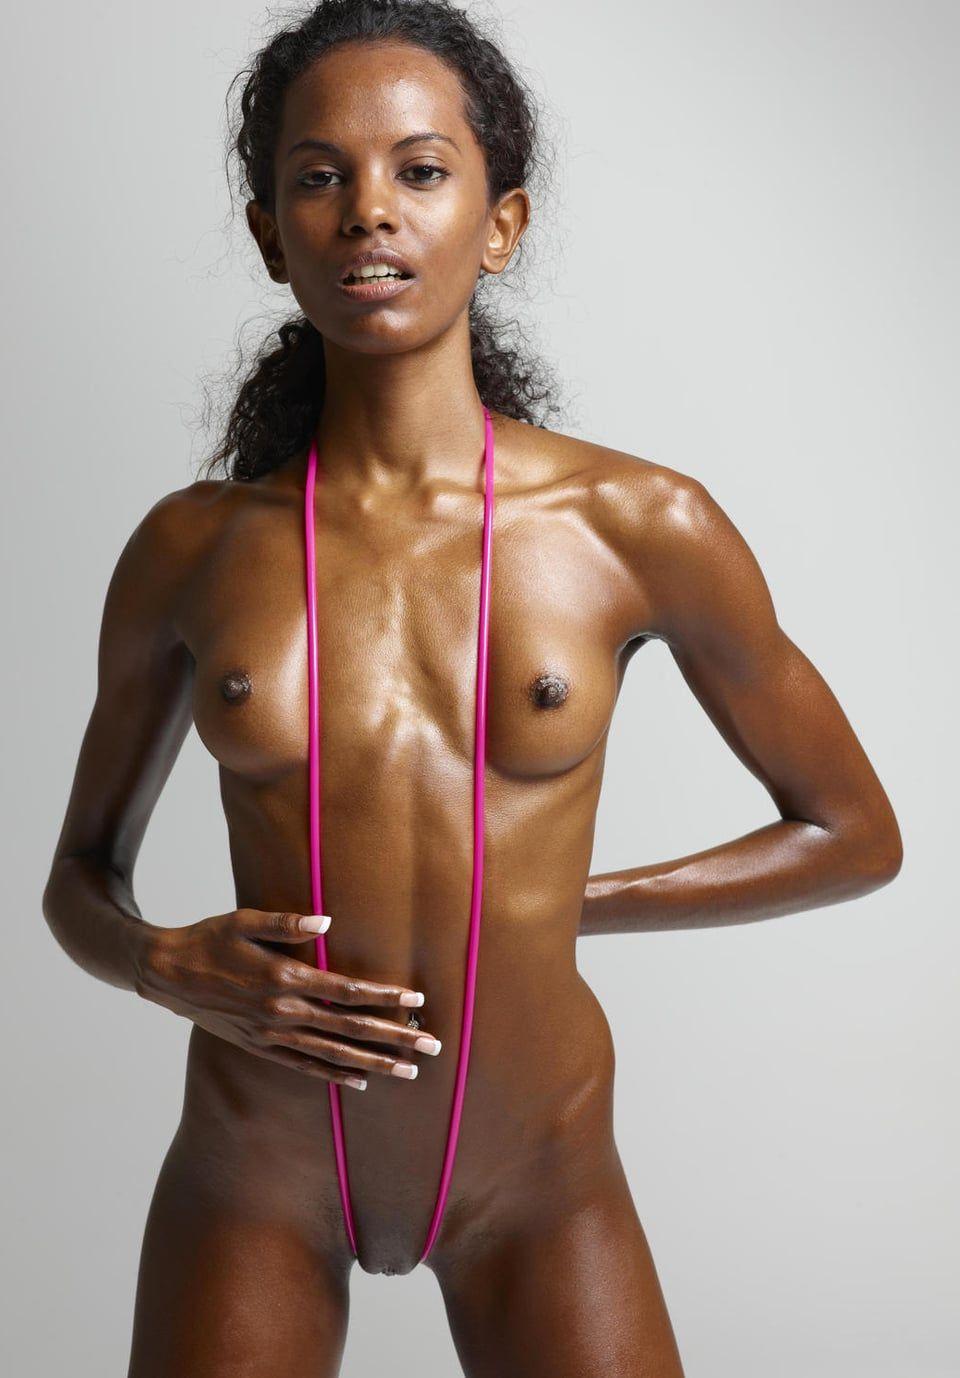 Amateur Ebony Pussy Play